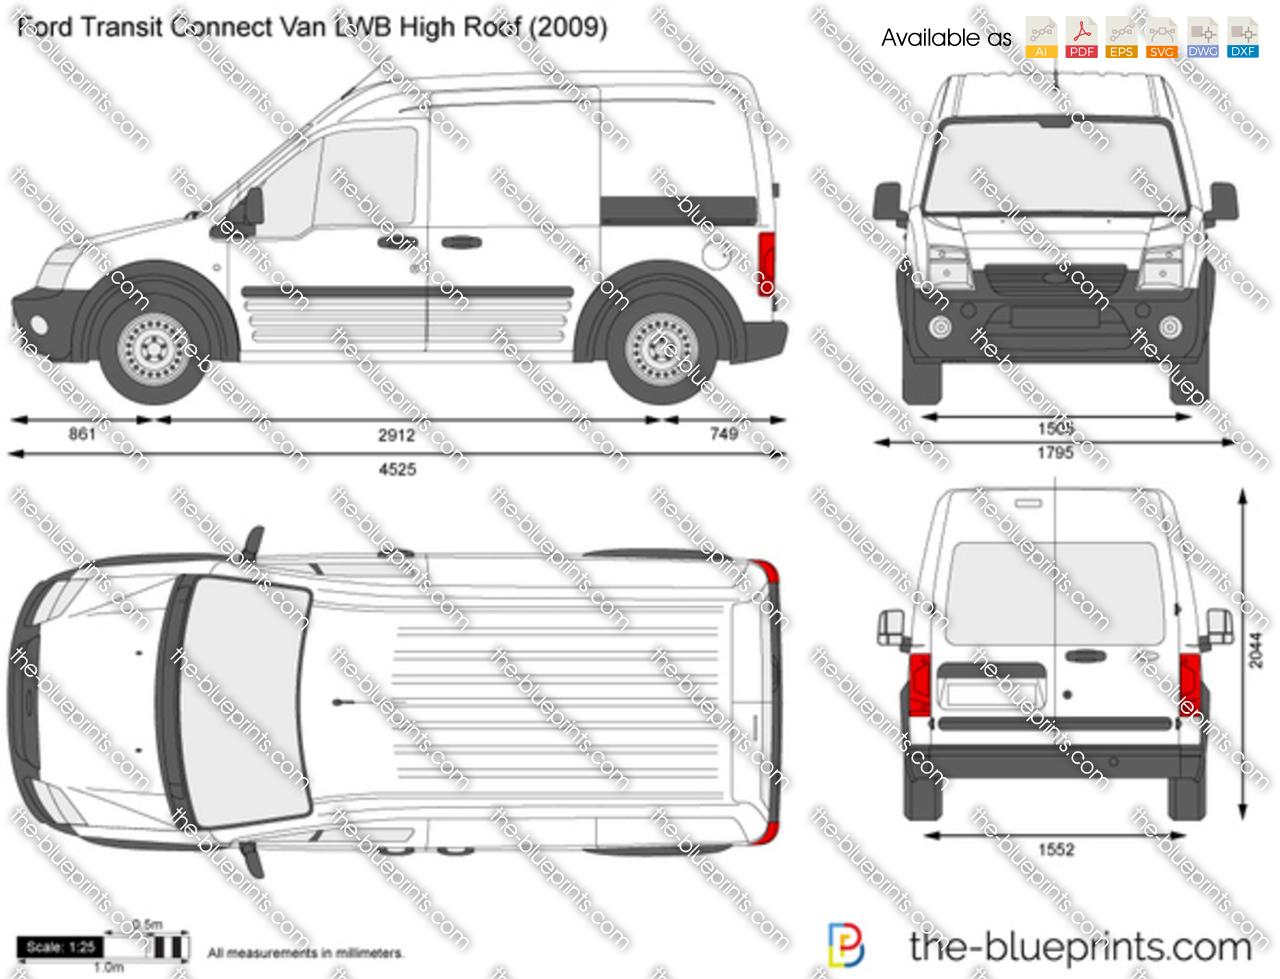 Ford 15 passenger van interior dimensions www galleryhip com the hippest pics